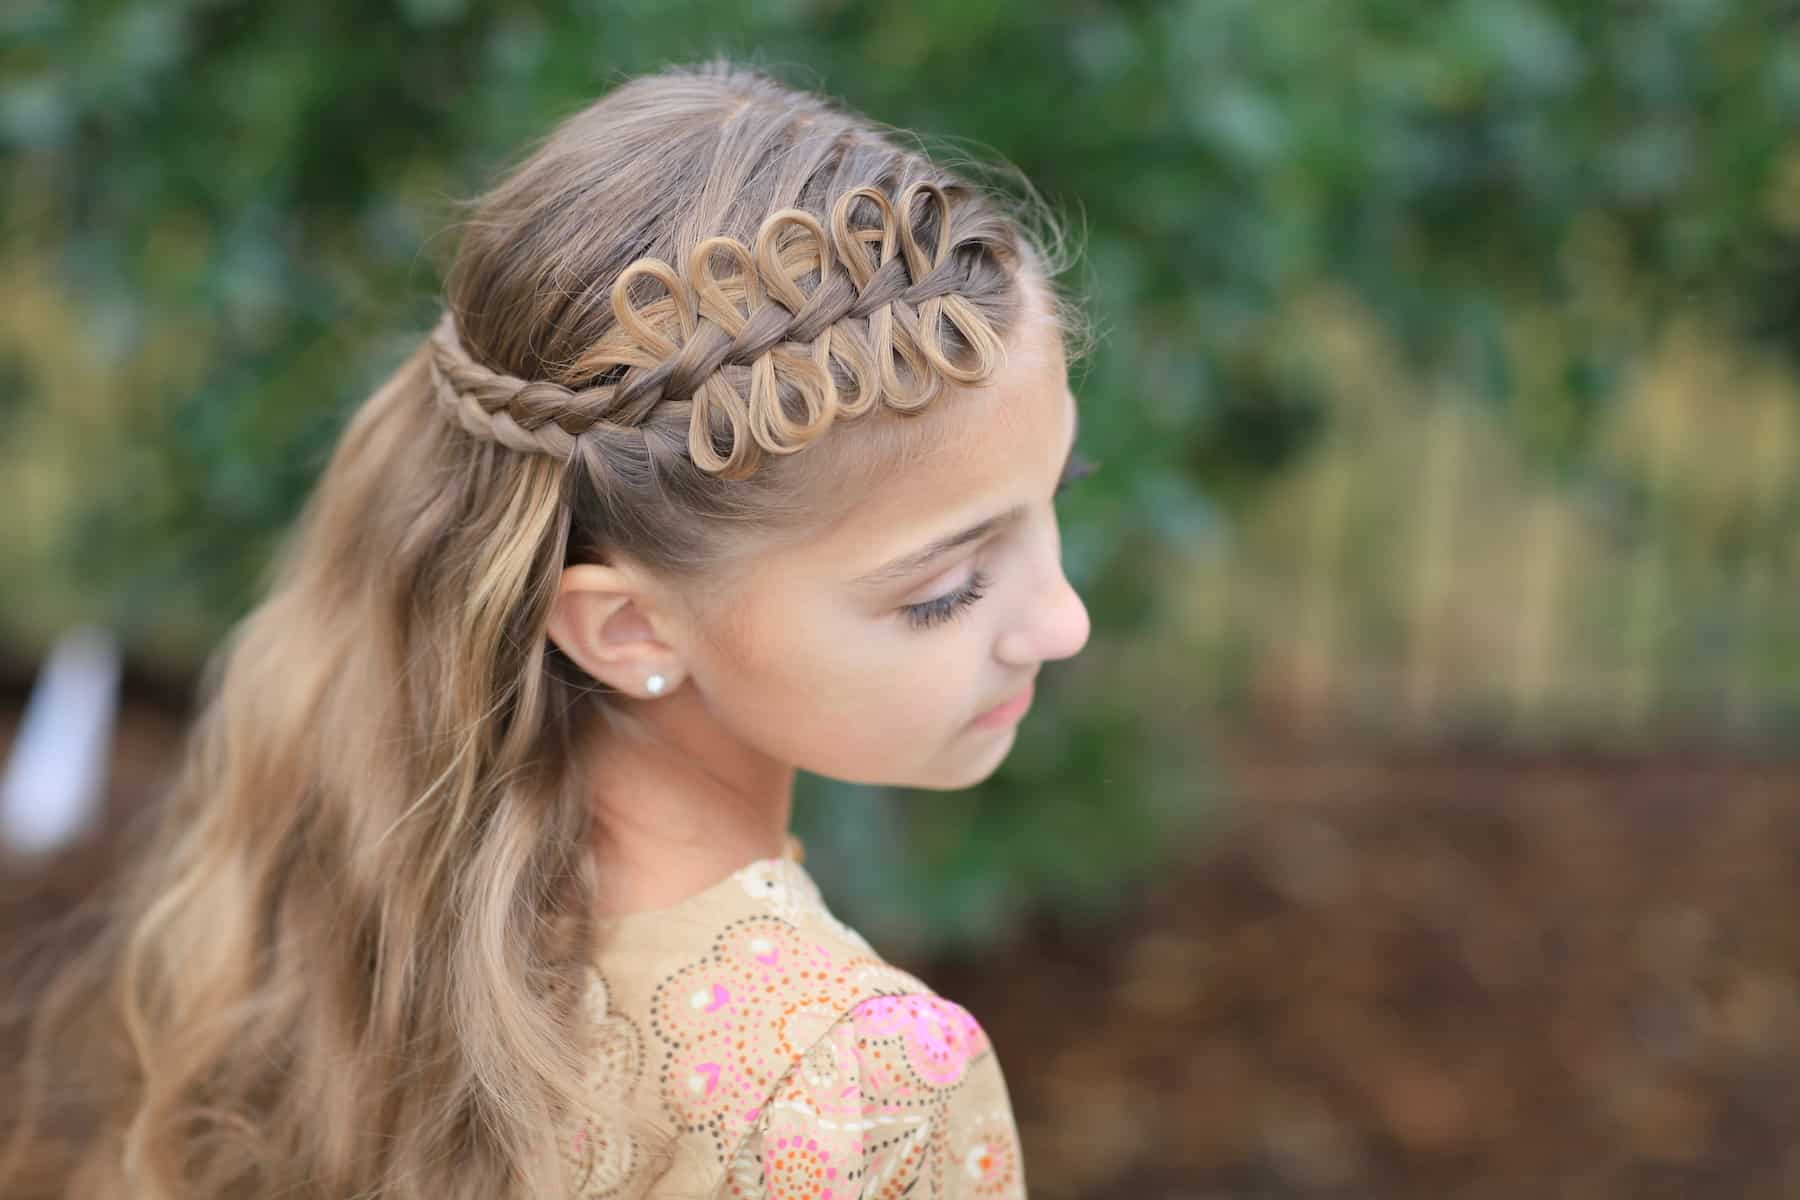 Sensacional peinados niñas sencillos Galería de cortes de pelo Ideas - Peinados para Niñas: Fáciles, Rapidos y Bonitos 2020 - 2021